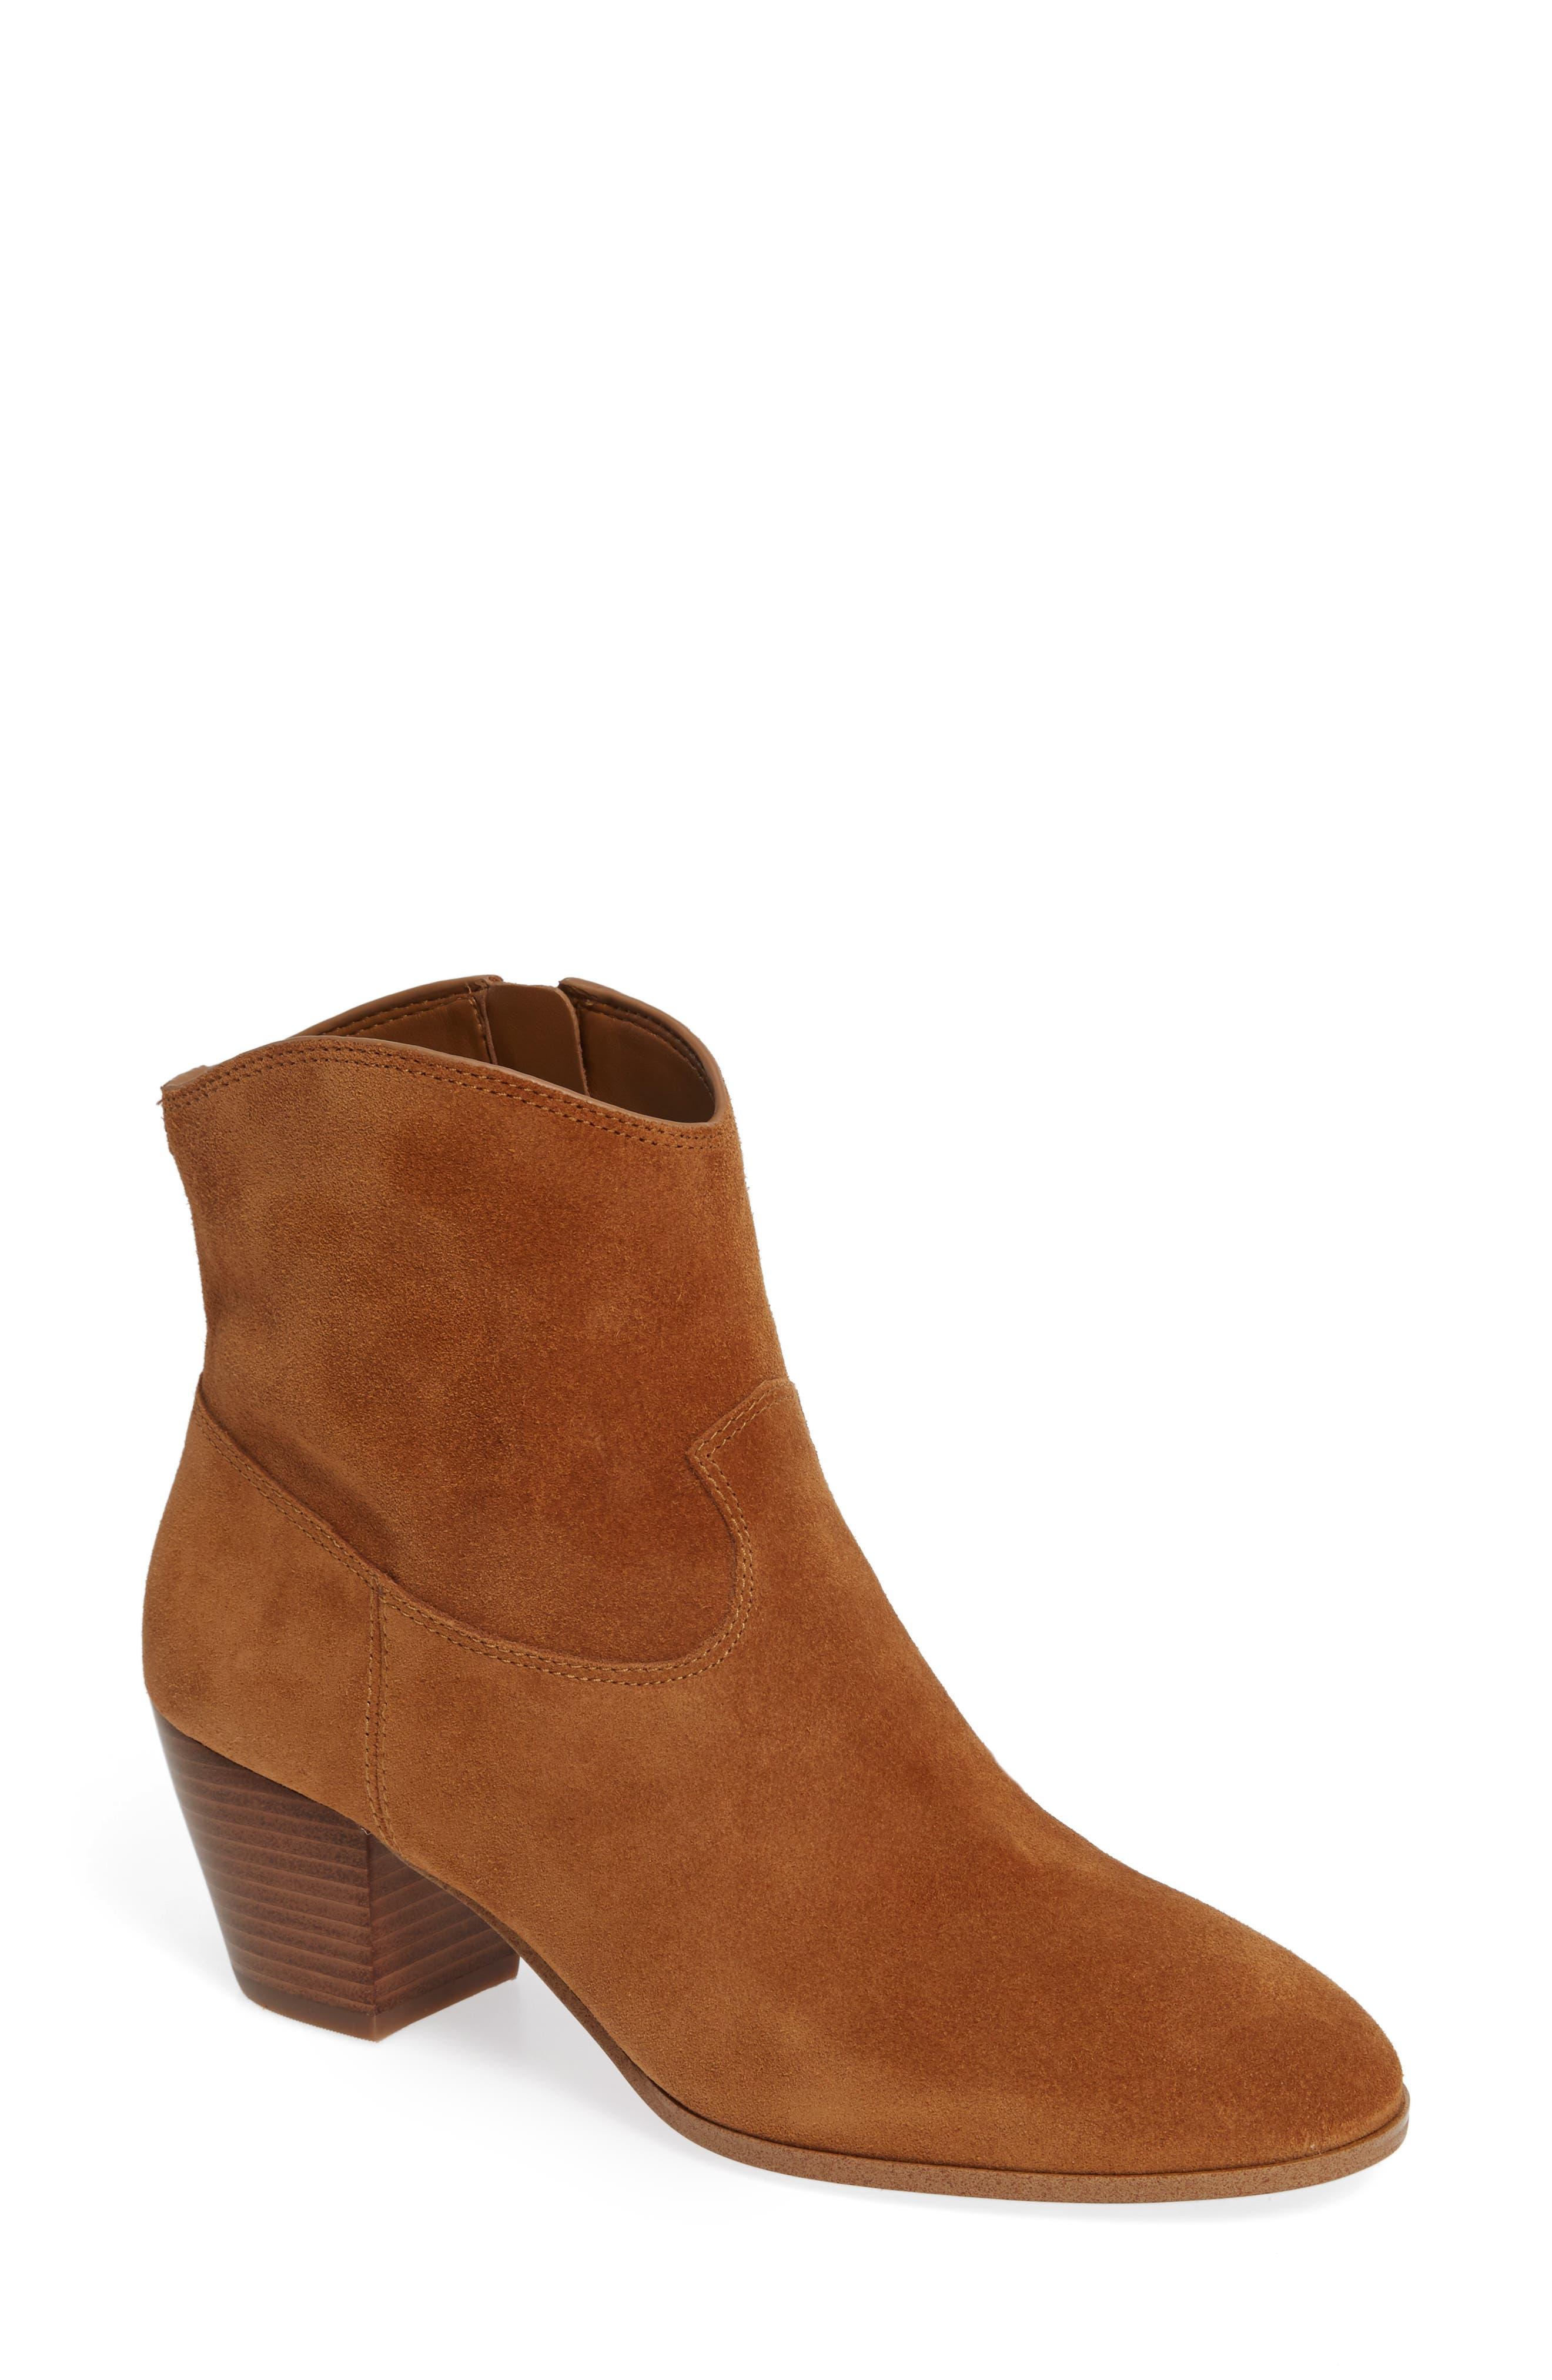 Michael Michael Kors Avery Ankle Boot